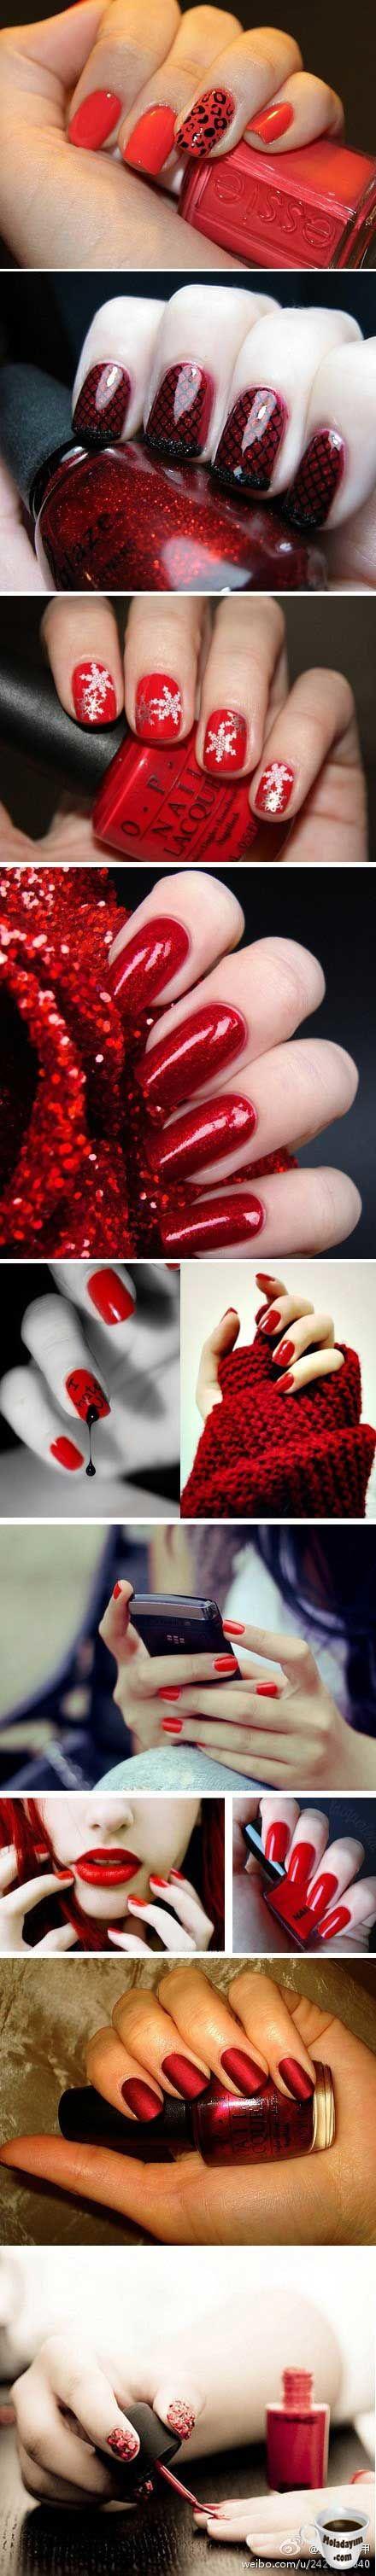 20120306011404_XRRaE.thumb.700_0